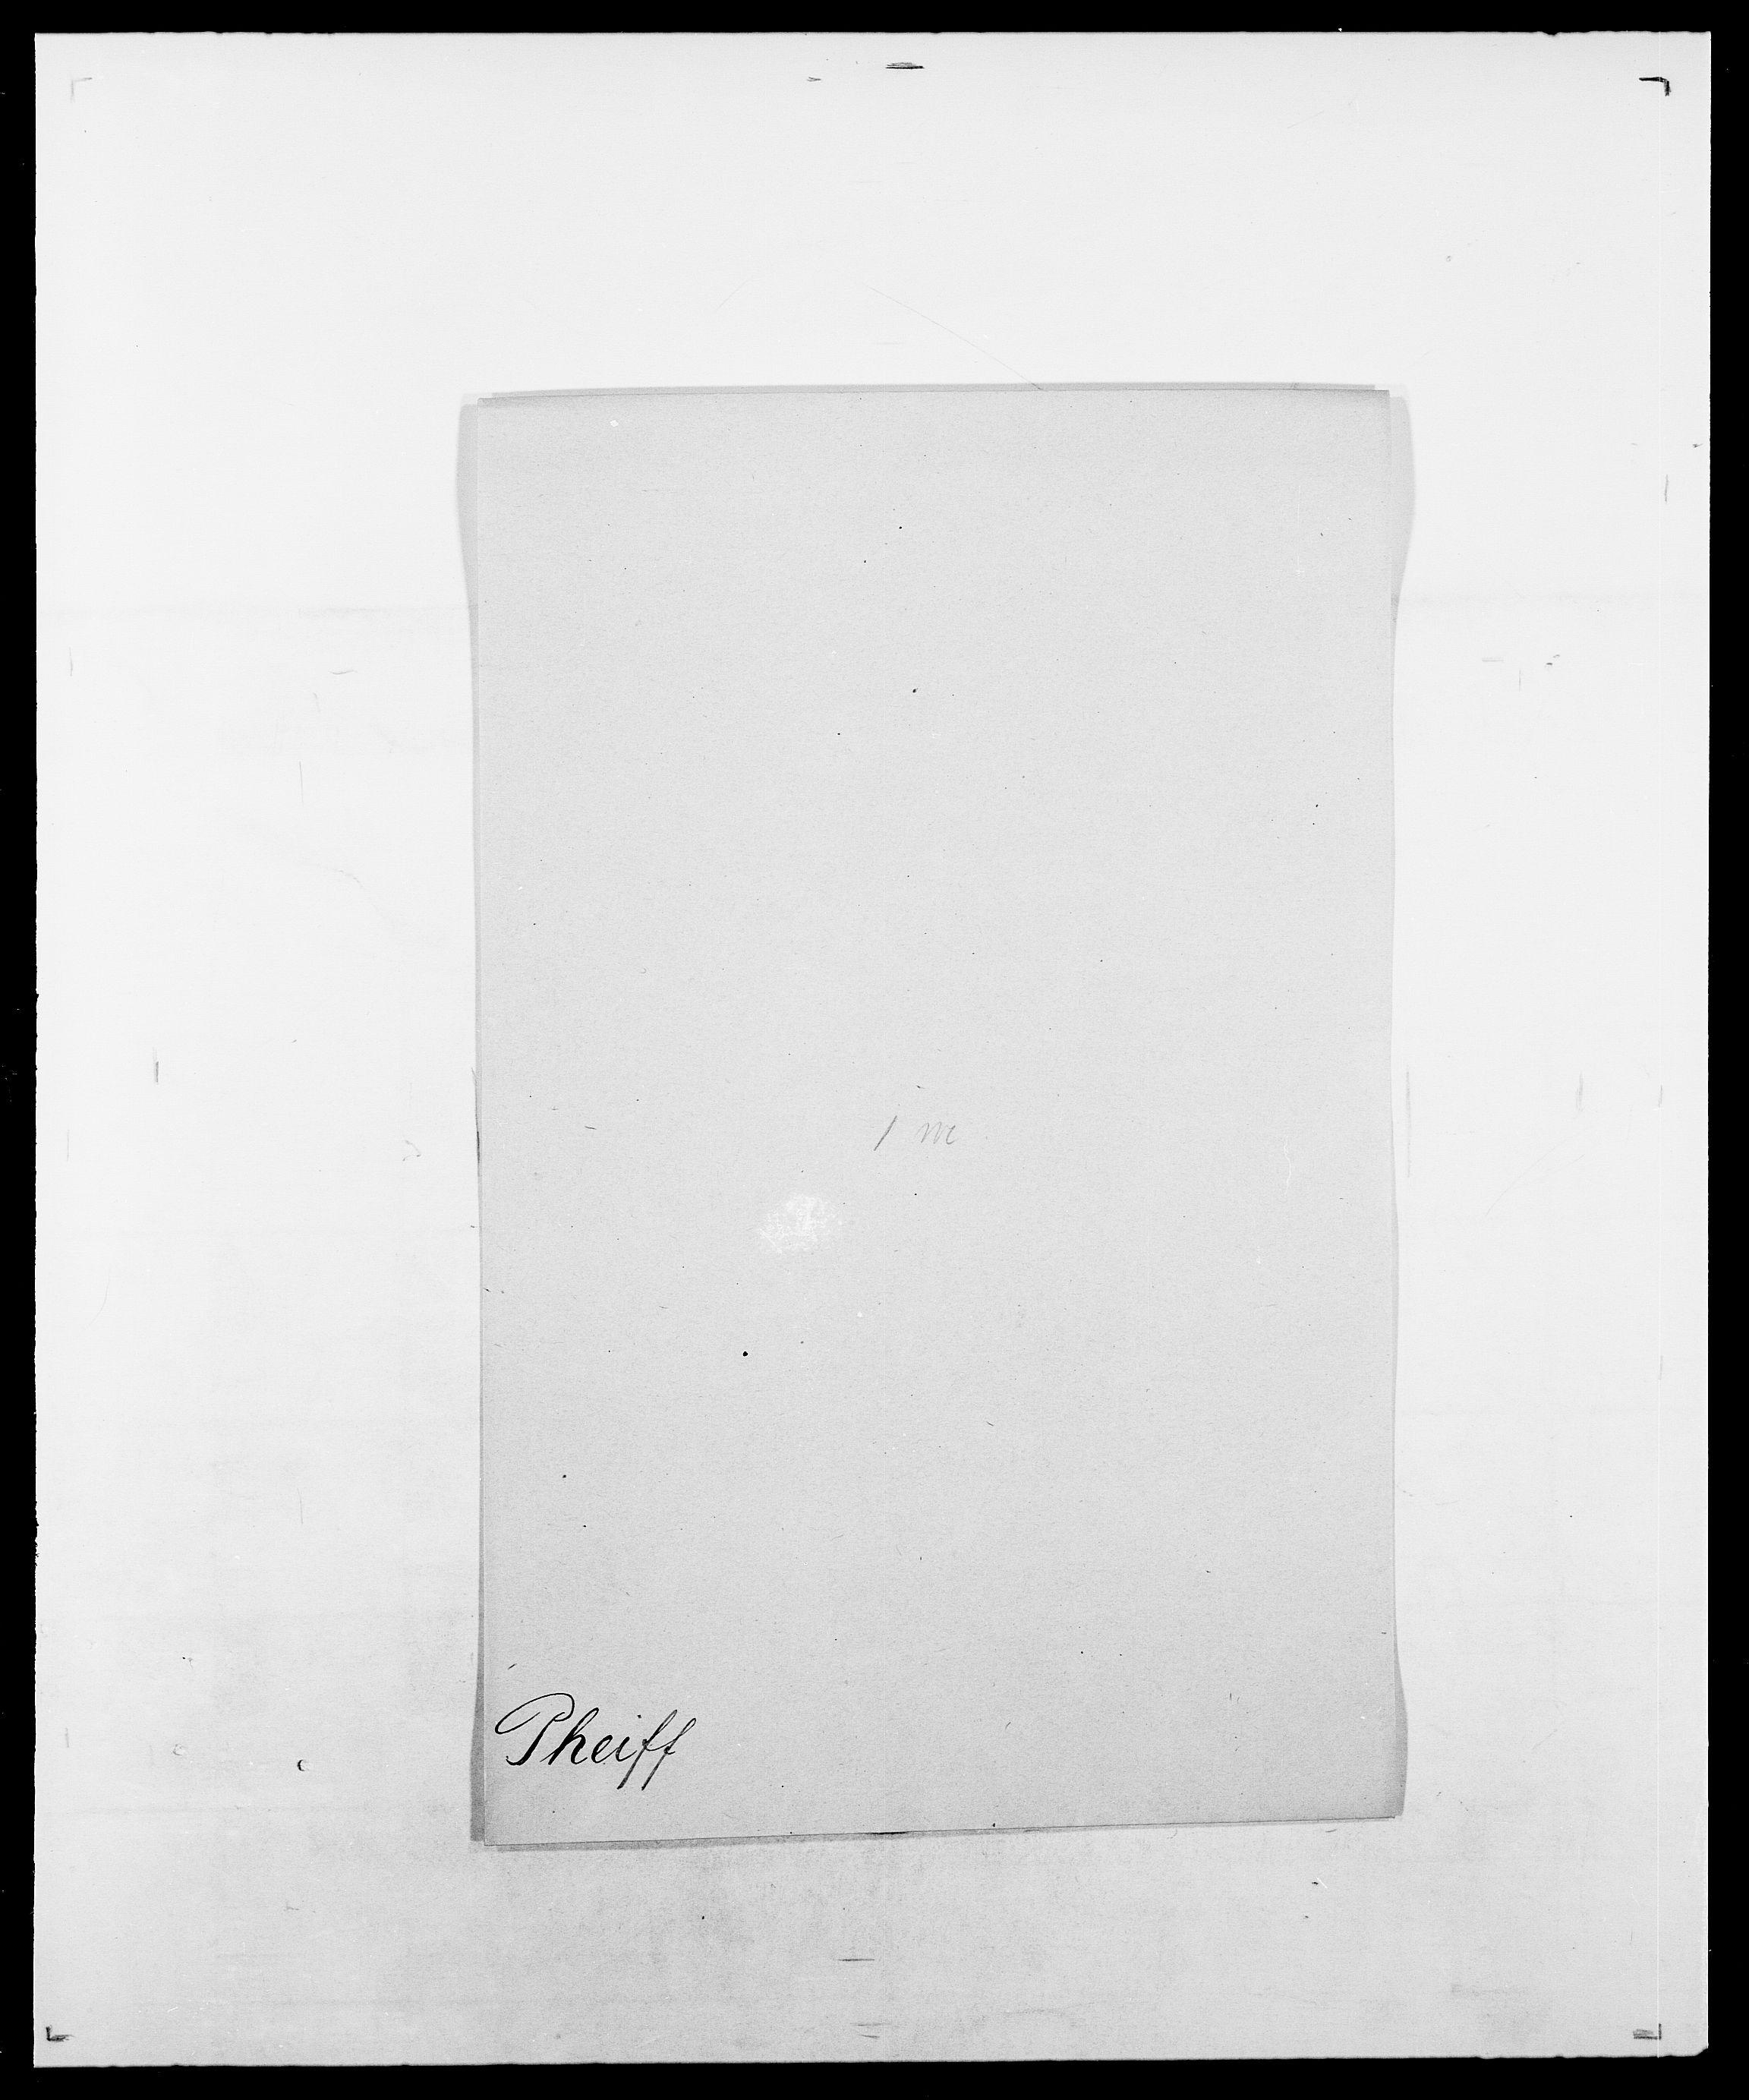 SAO, Delgobe, Charles Antoine - samling, D/Da/L0030: Paars - Pittelkov, s. 512